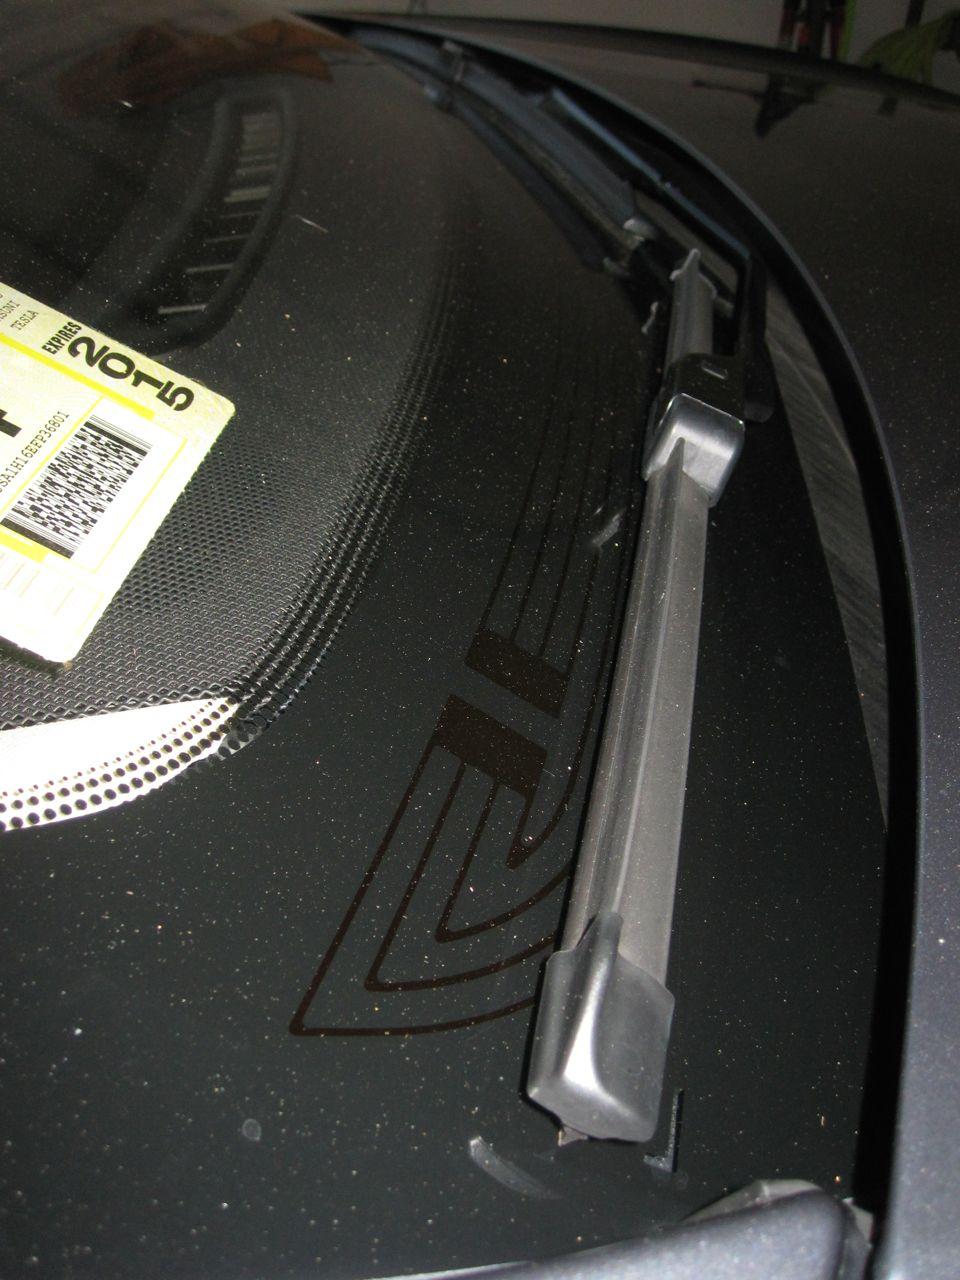 Wiper blade defrosters